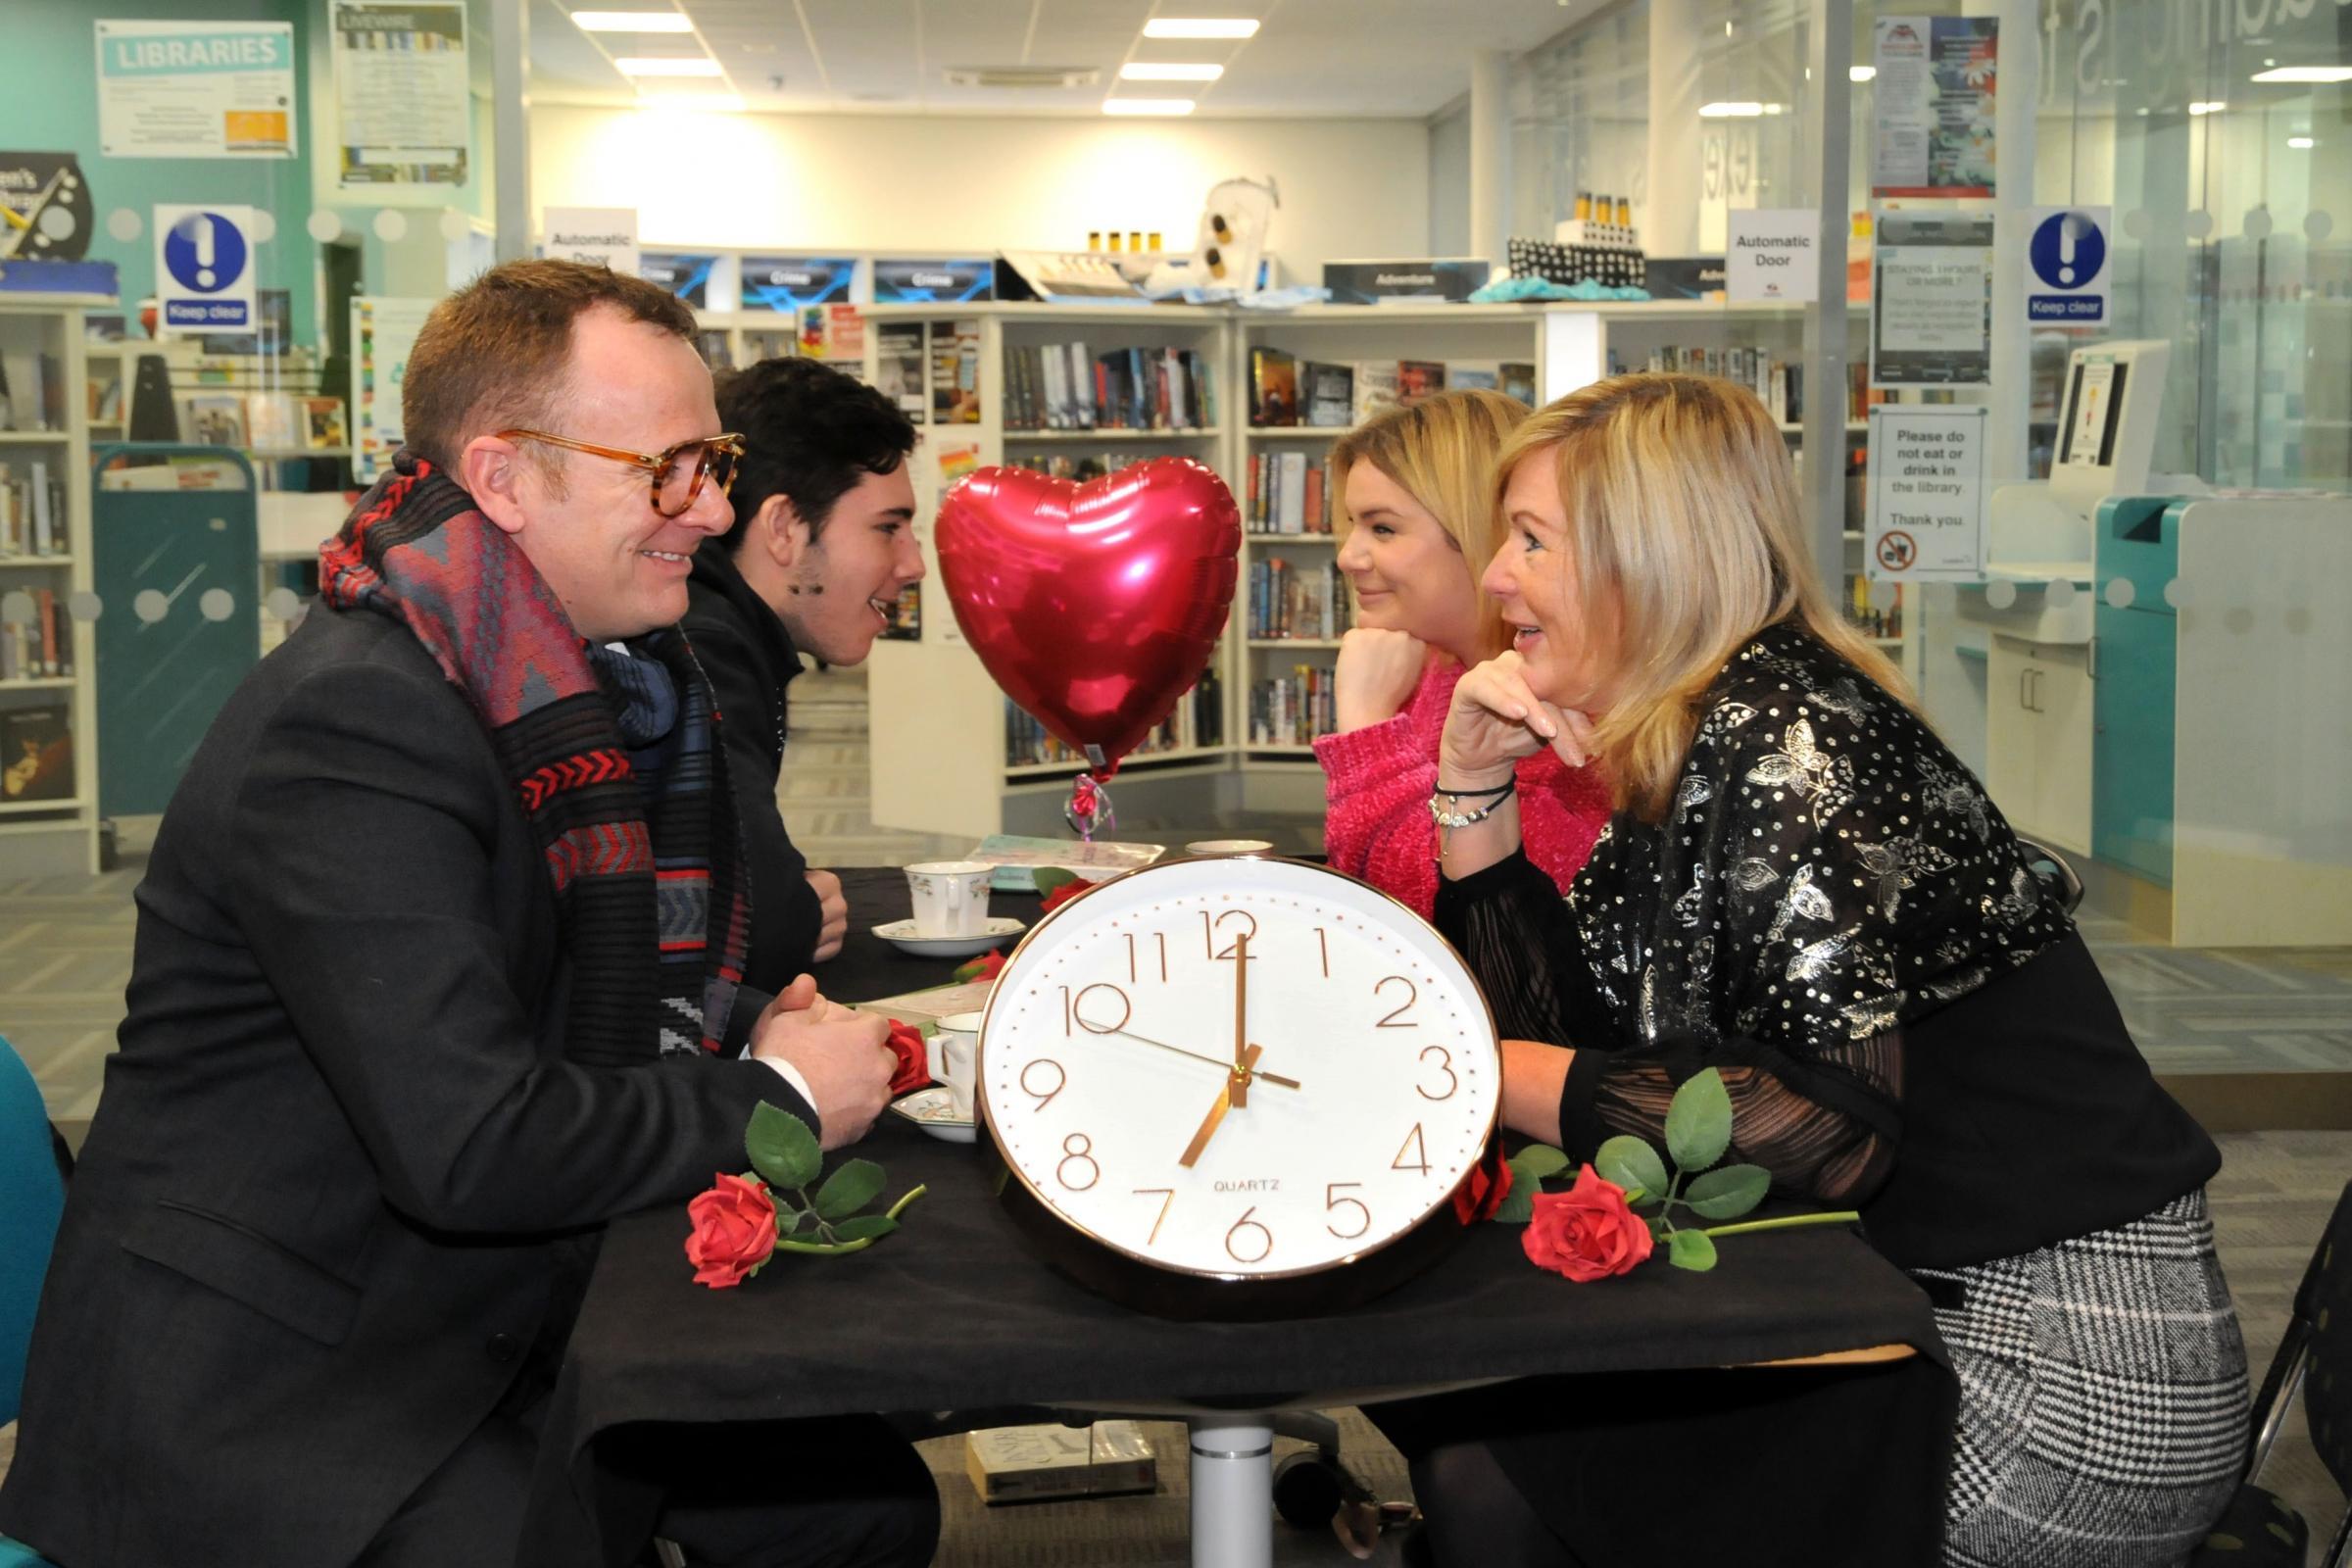 hastighet dating Warrington Gay ned lav Dating Sites